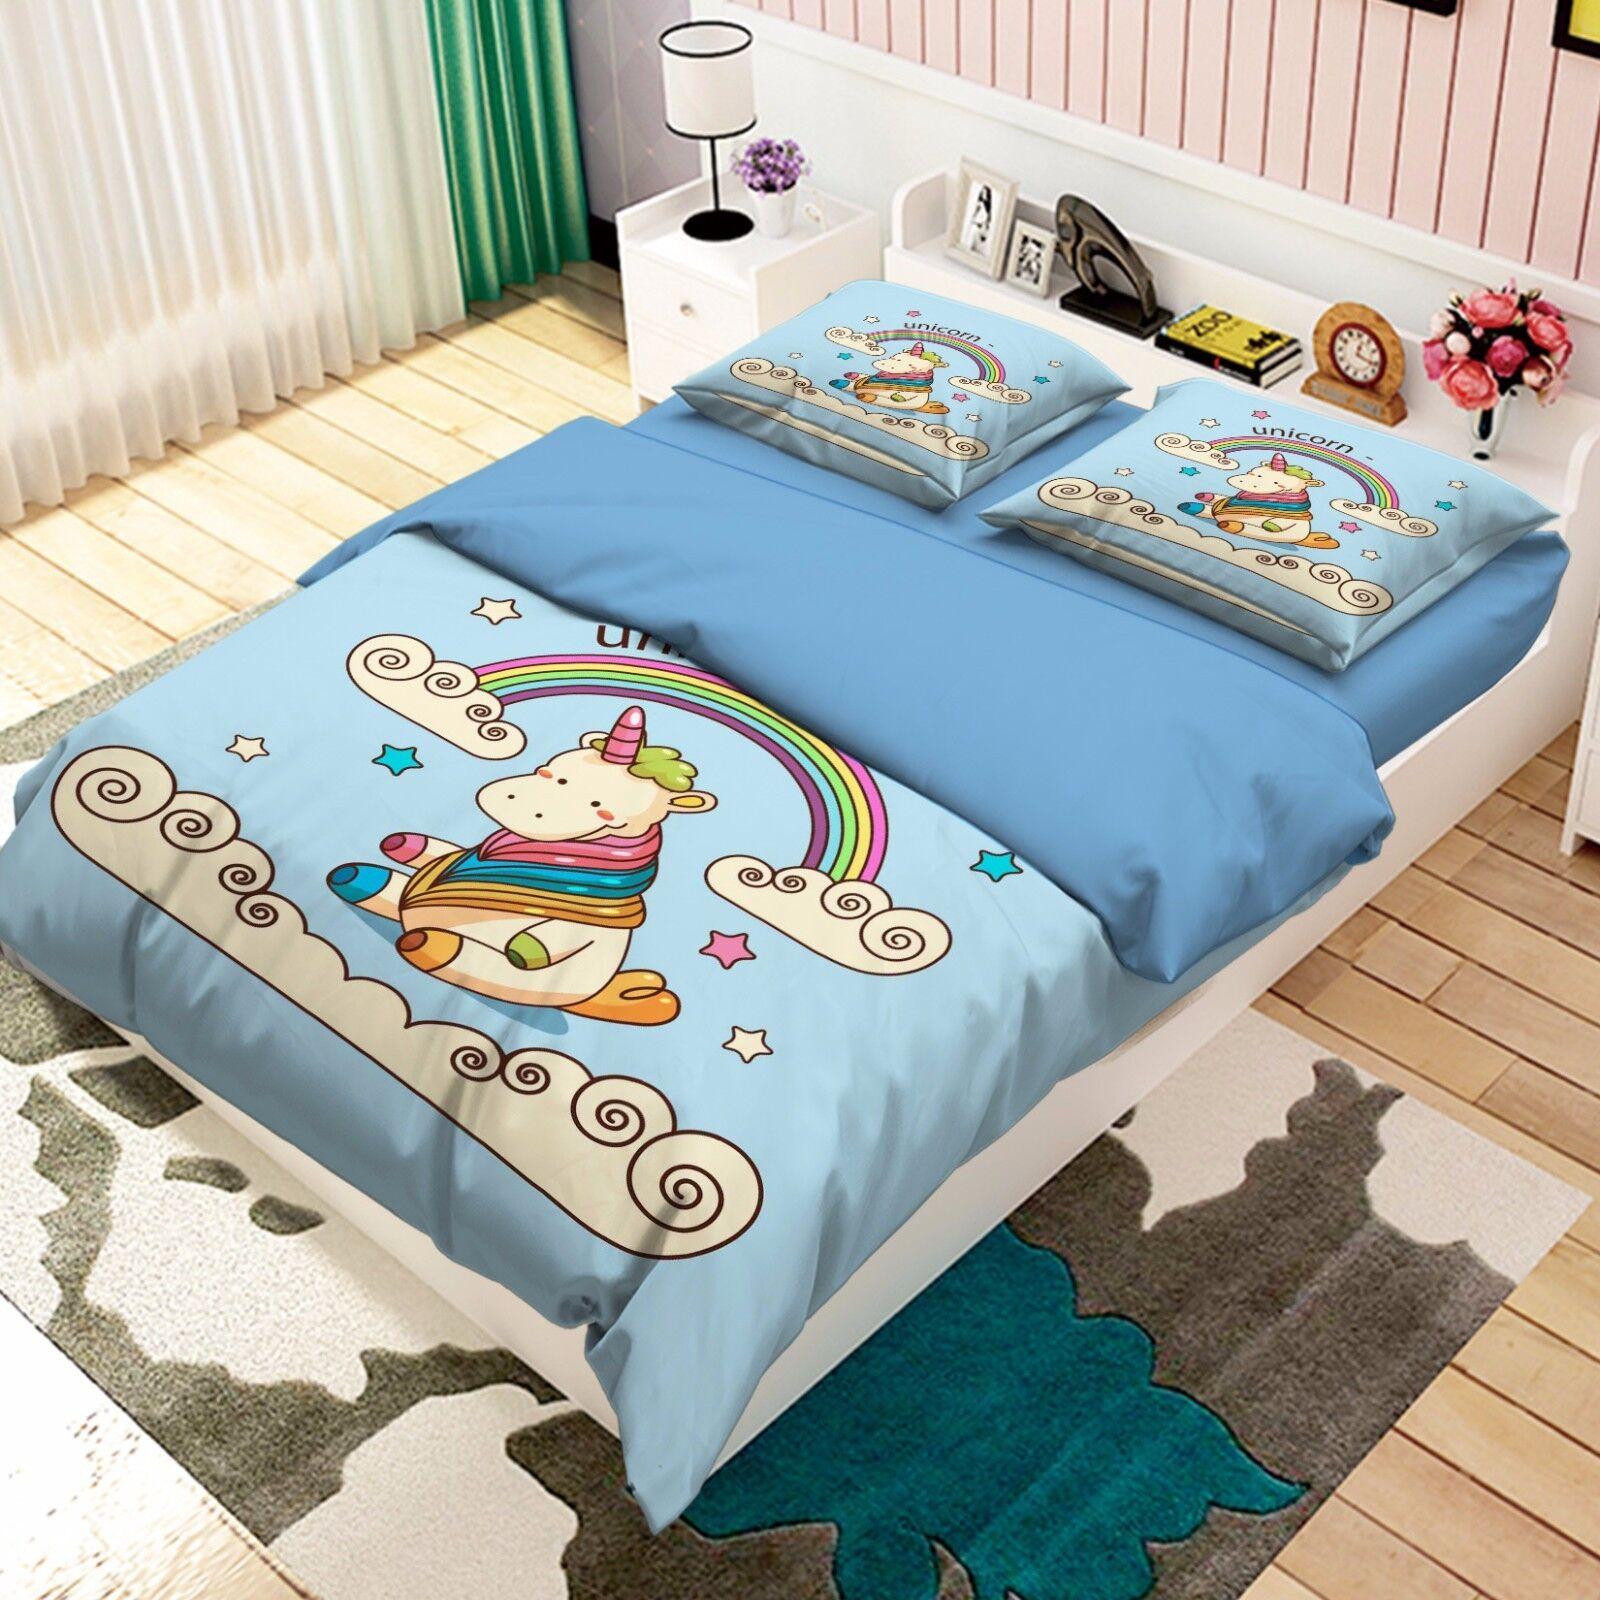 3D Rfainbow 906 Bed Pillowcases Quilt Duvet Cover Set Single Queen UK Kyra